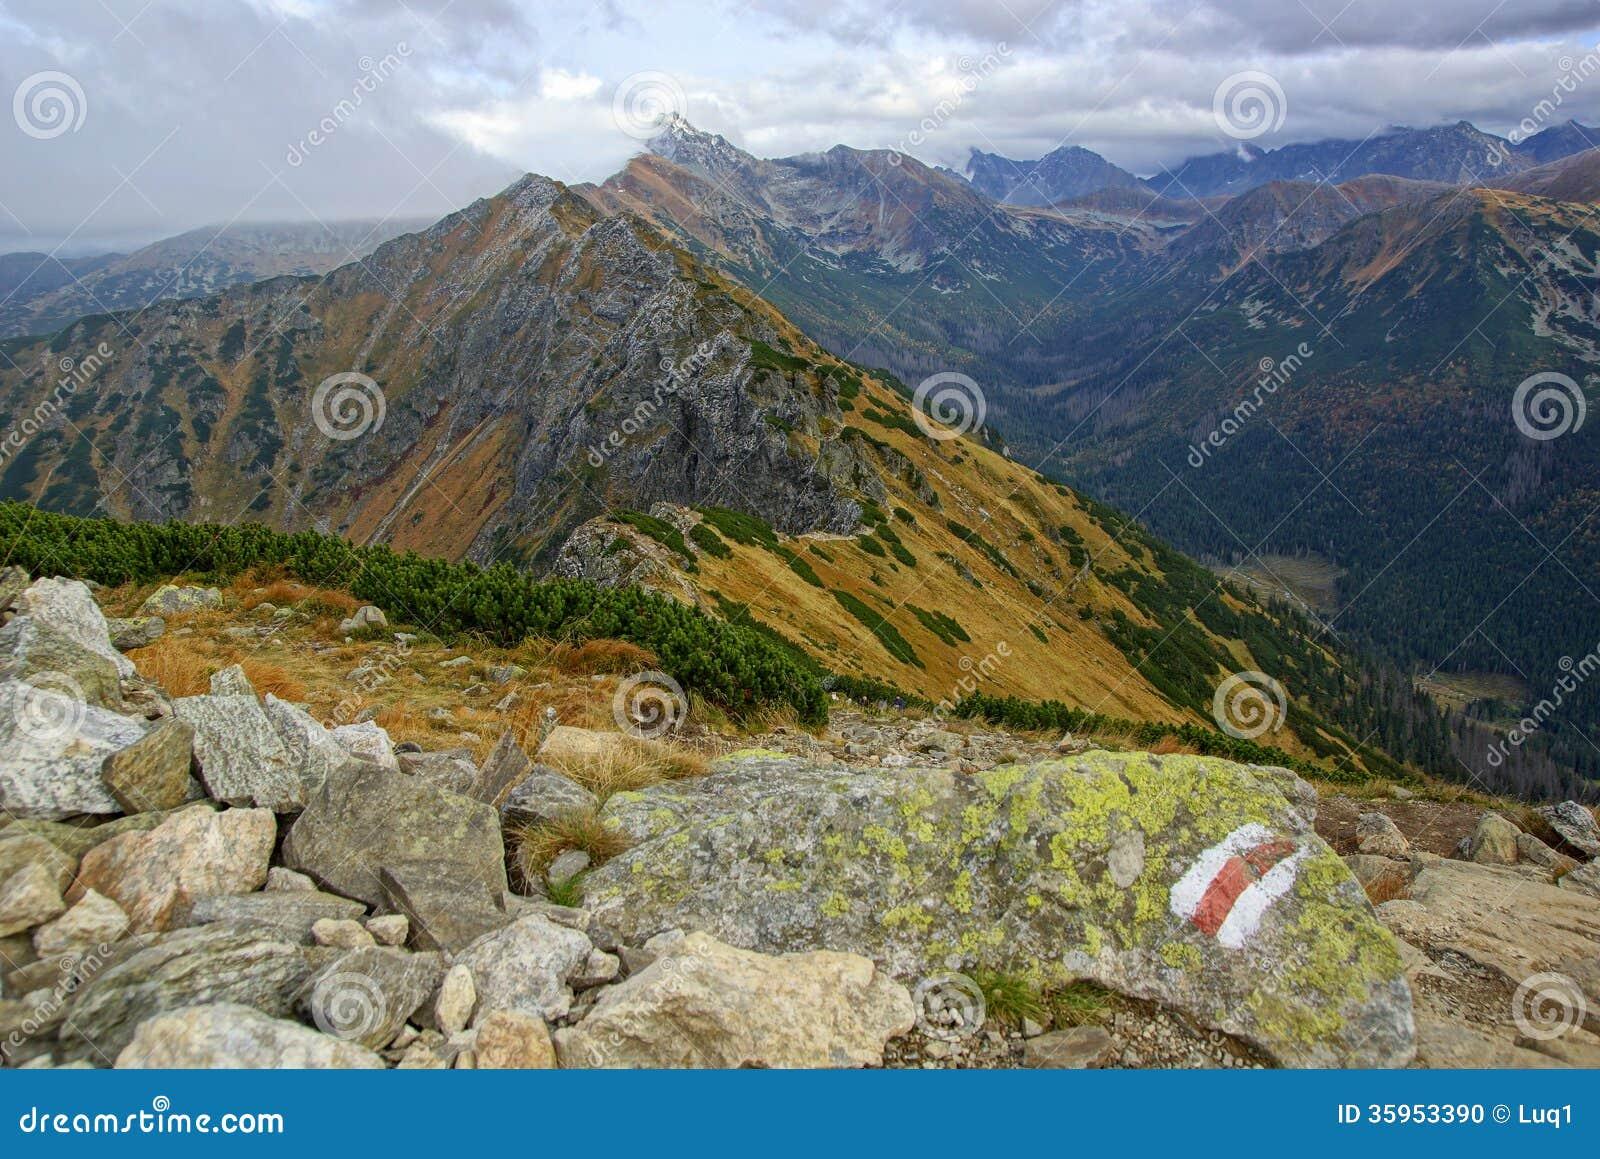 Paisaje de las altas montañas de Tatras, Polonia